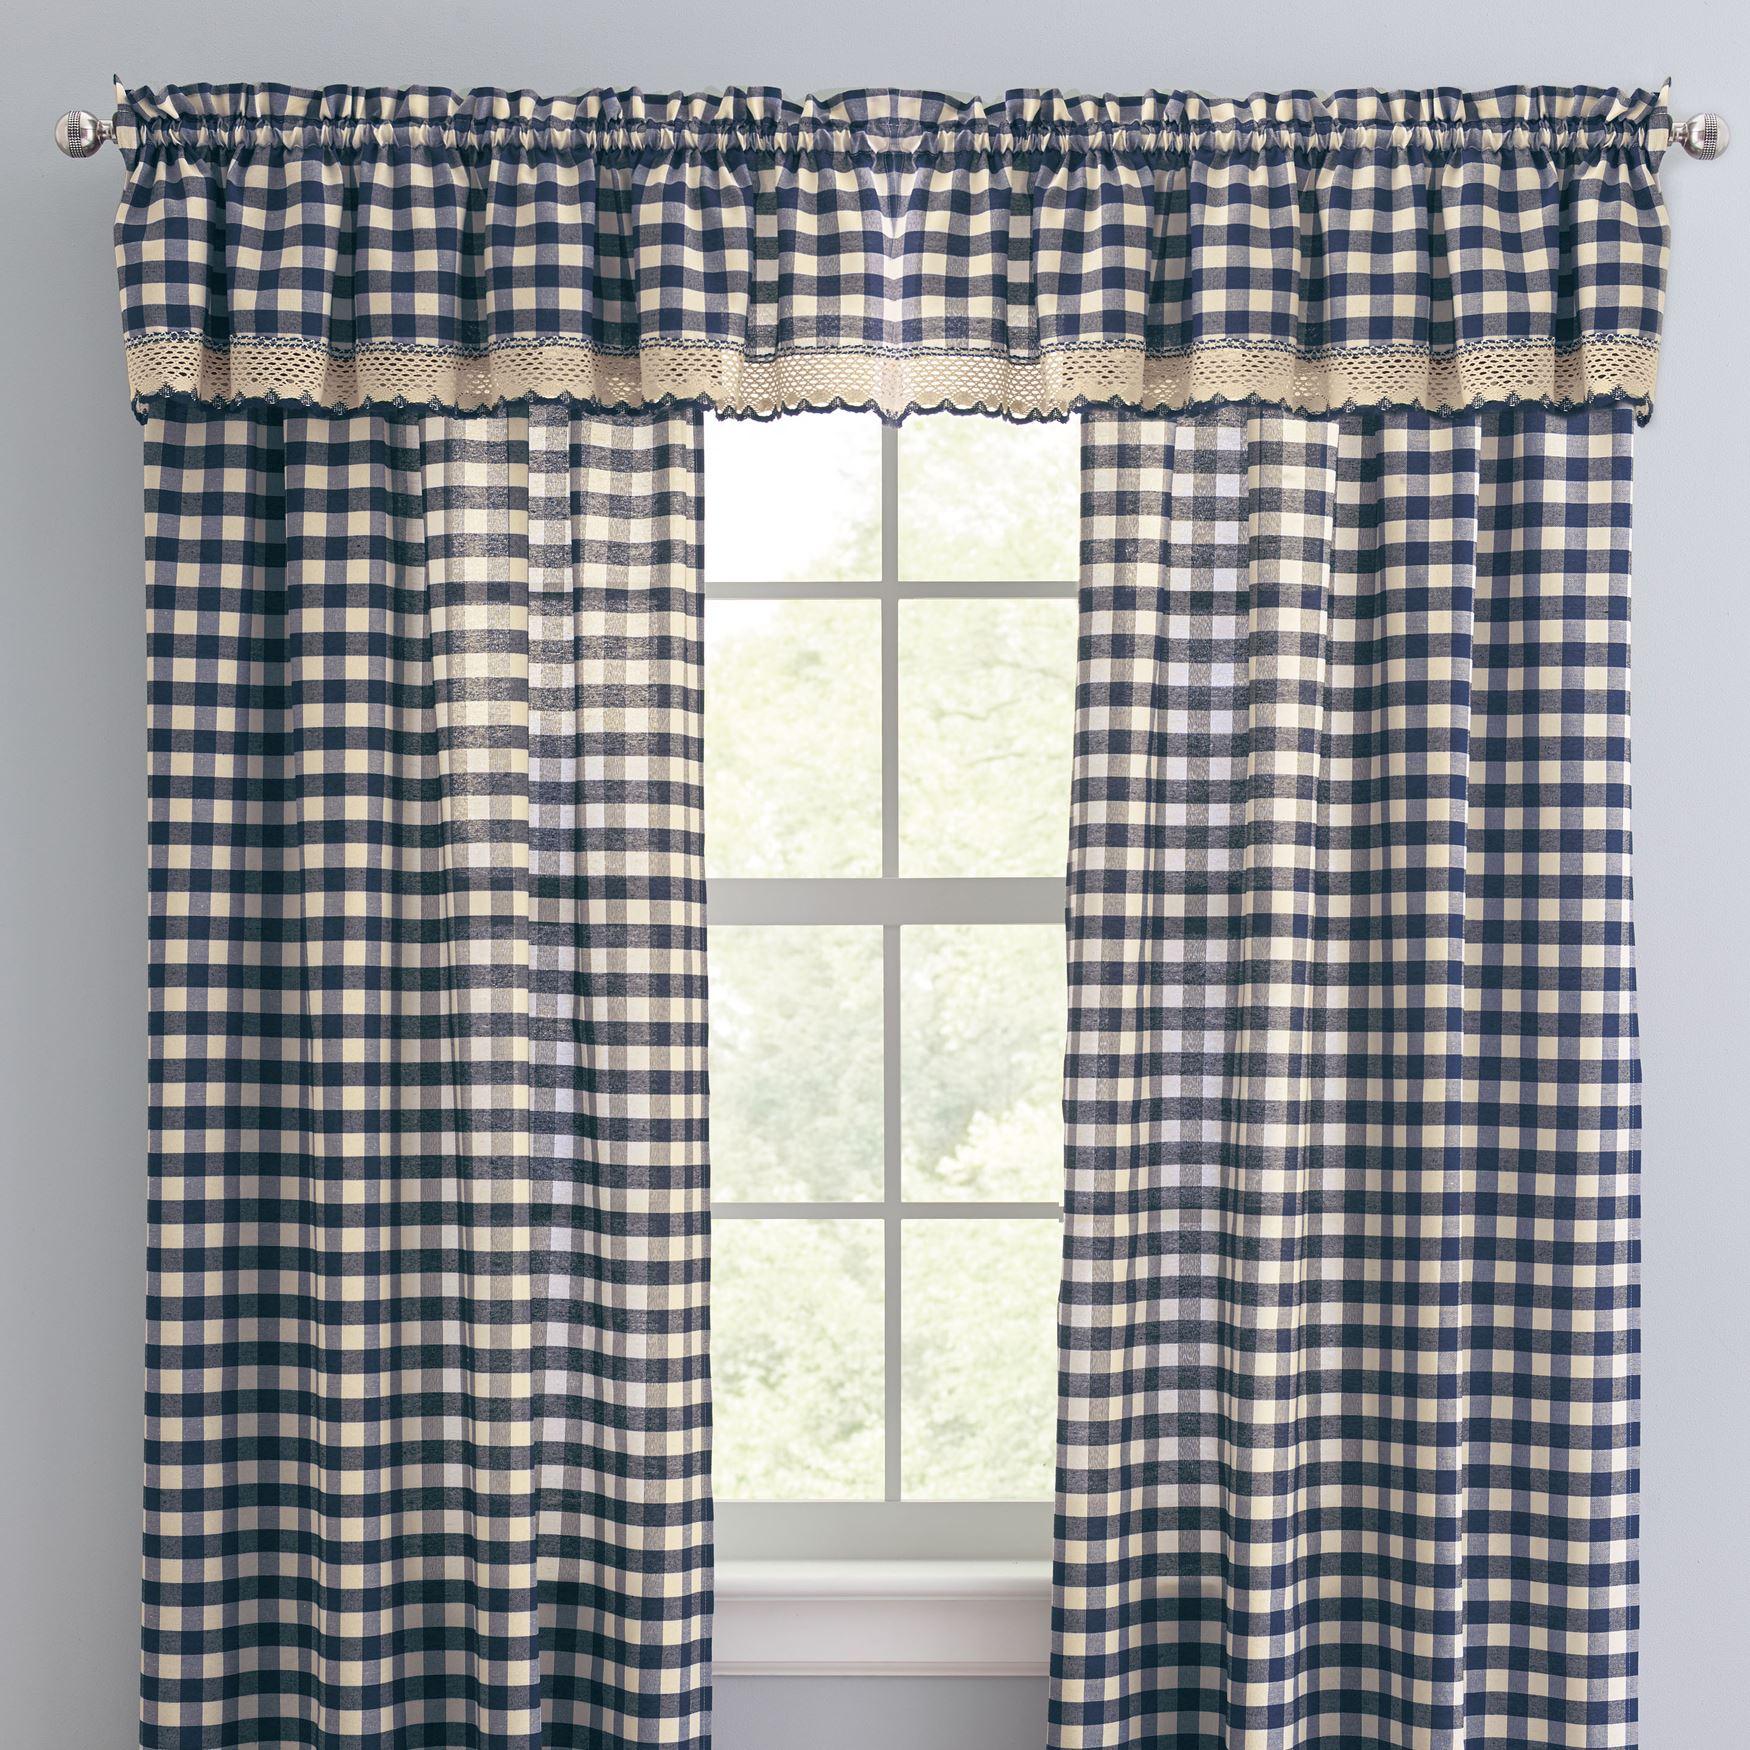 Buffalo plaid window collection